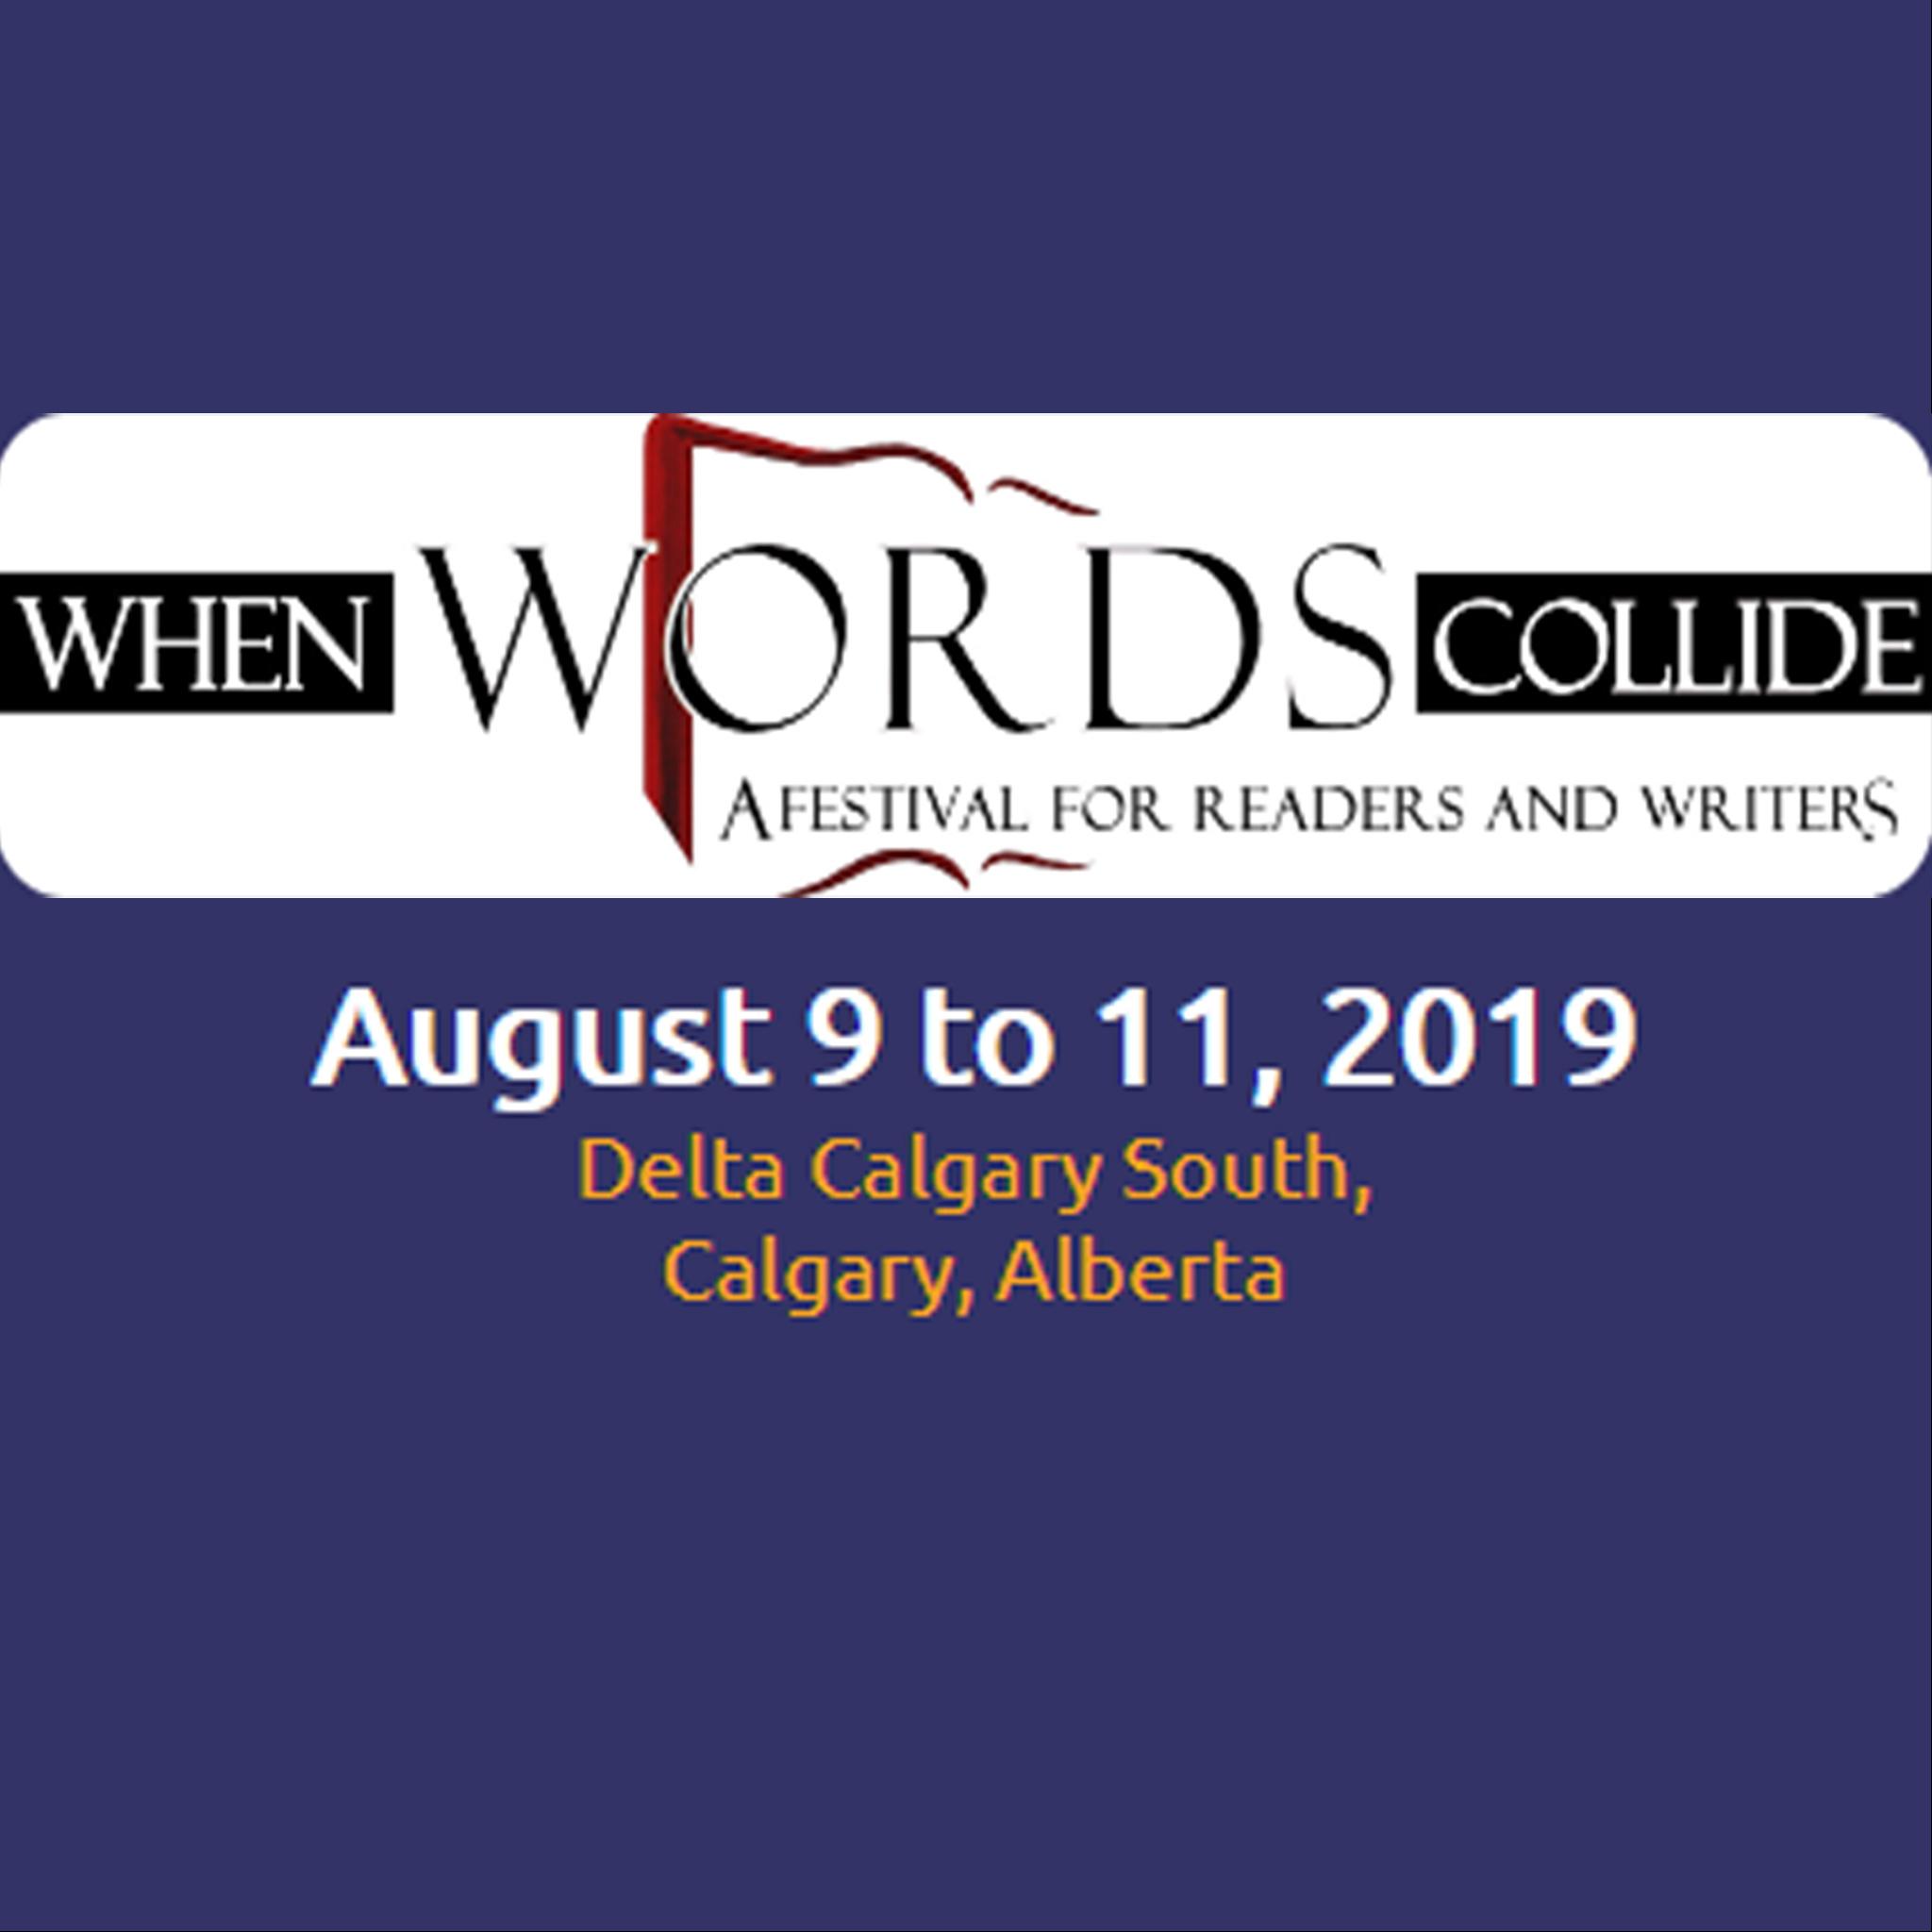 When Words Collide 2019